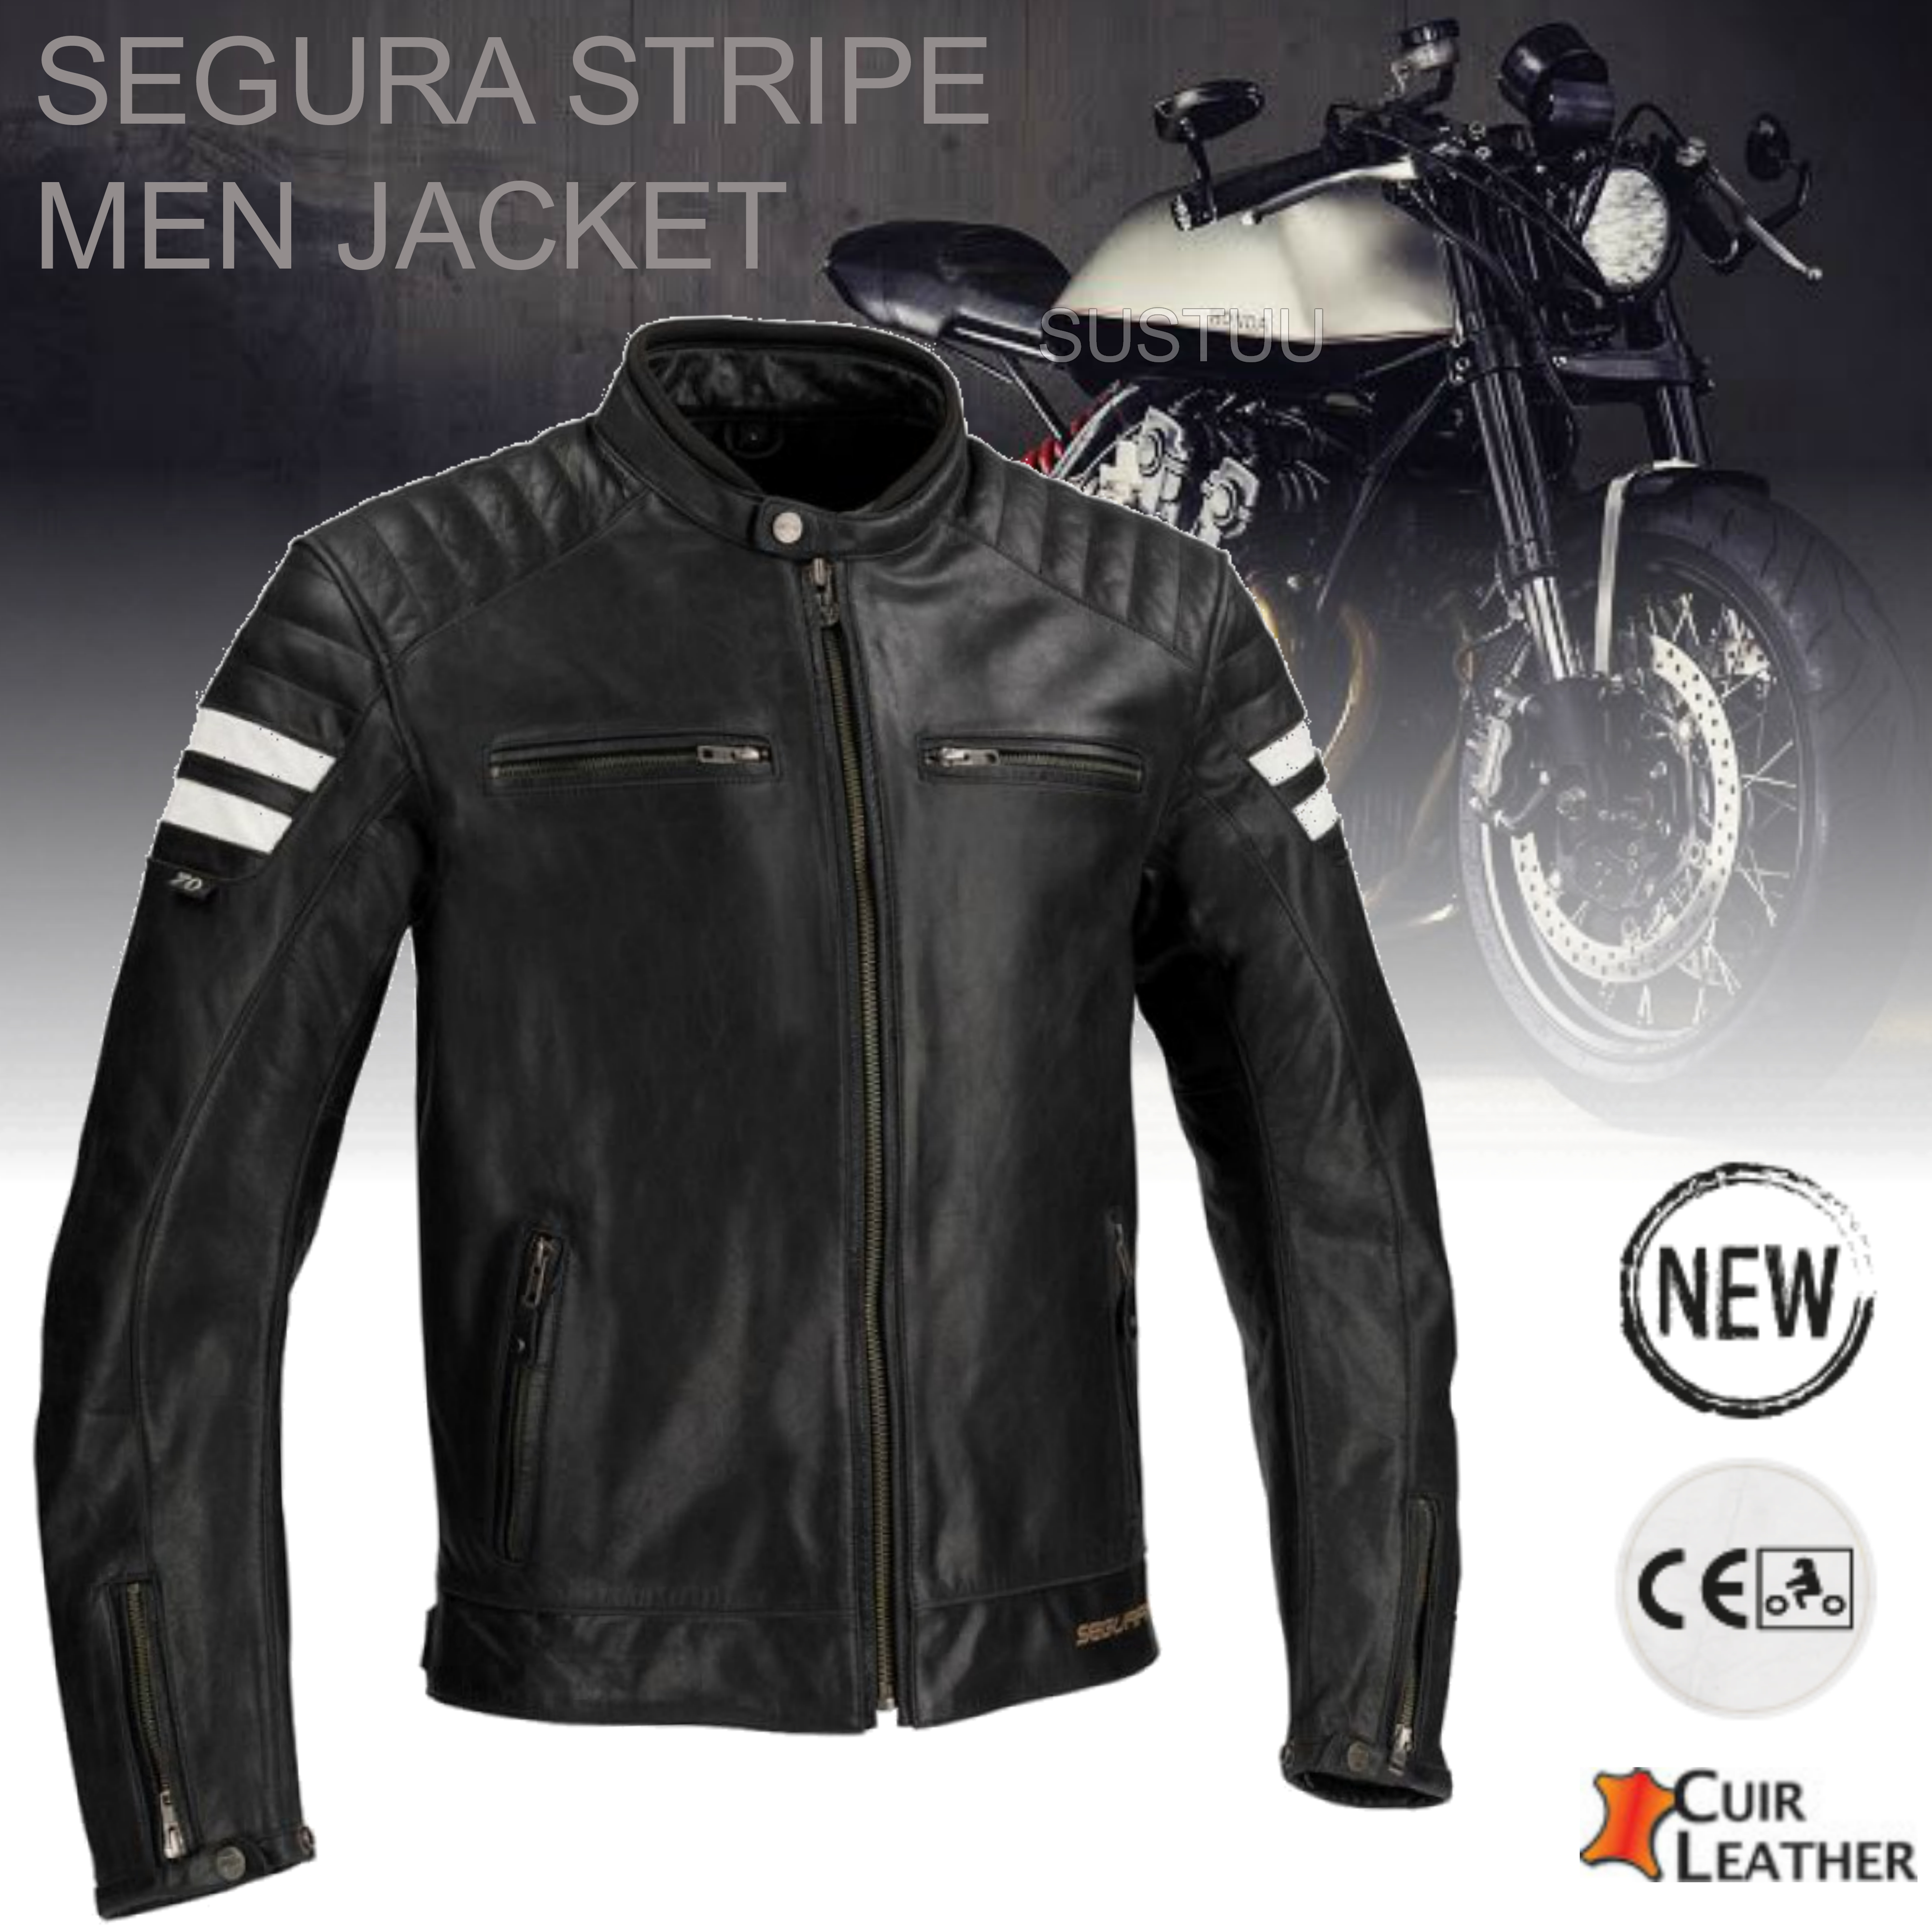 New Segura Stripe Motorcycle/Bike Men Buffalo Leather Jacket|Body-Fit|CE Approved|Black